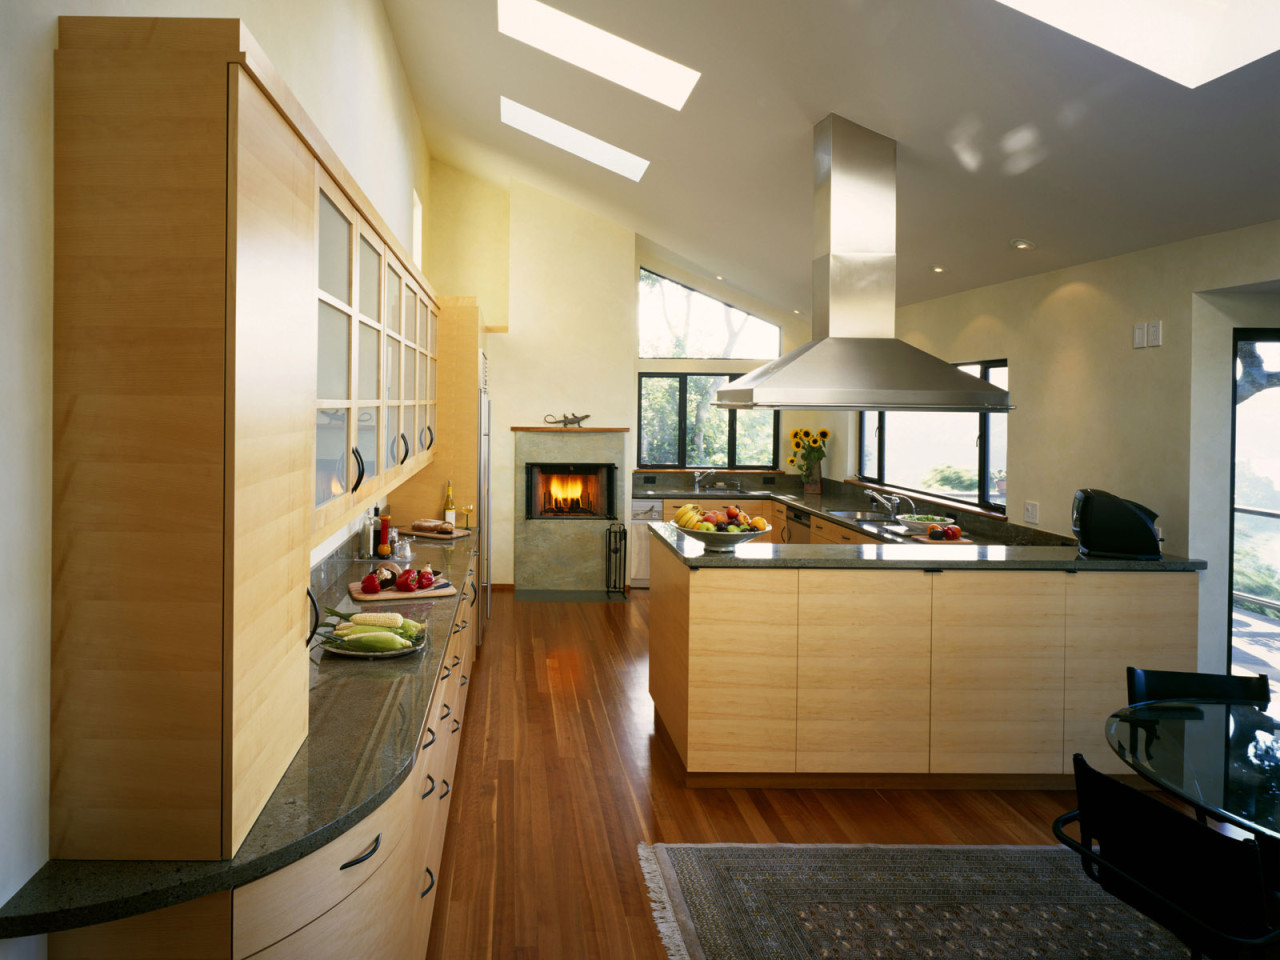 Бежево-серый кухонный гарнитур в стиле модерн